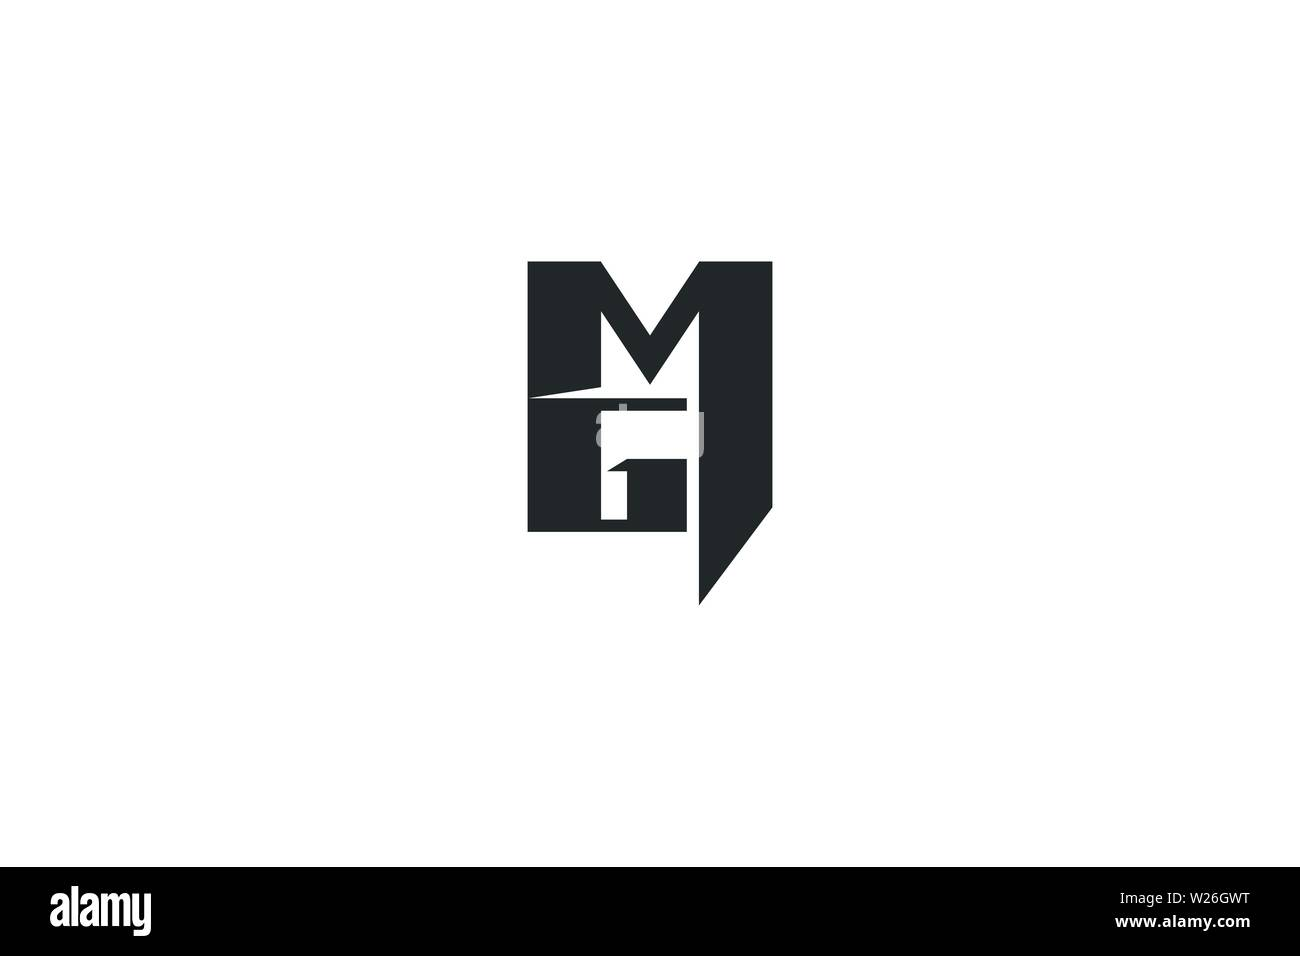 Letter M G Logo Designs Inspiration Isolated On White